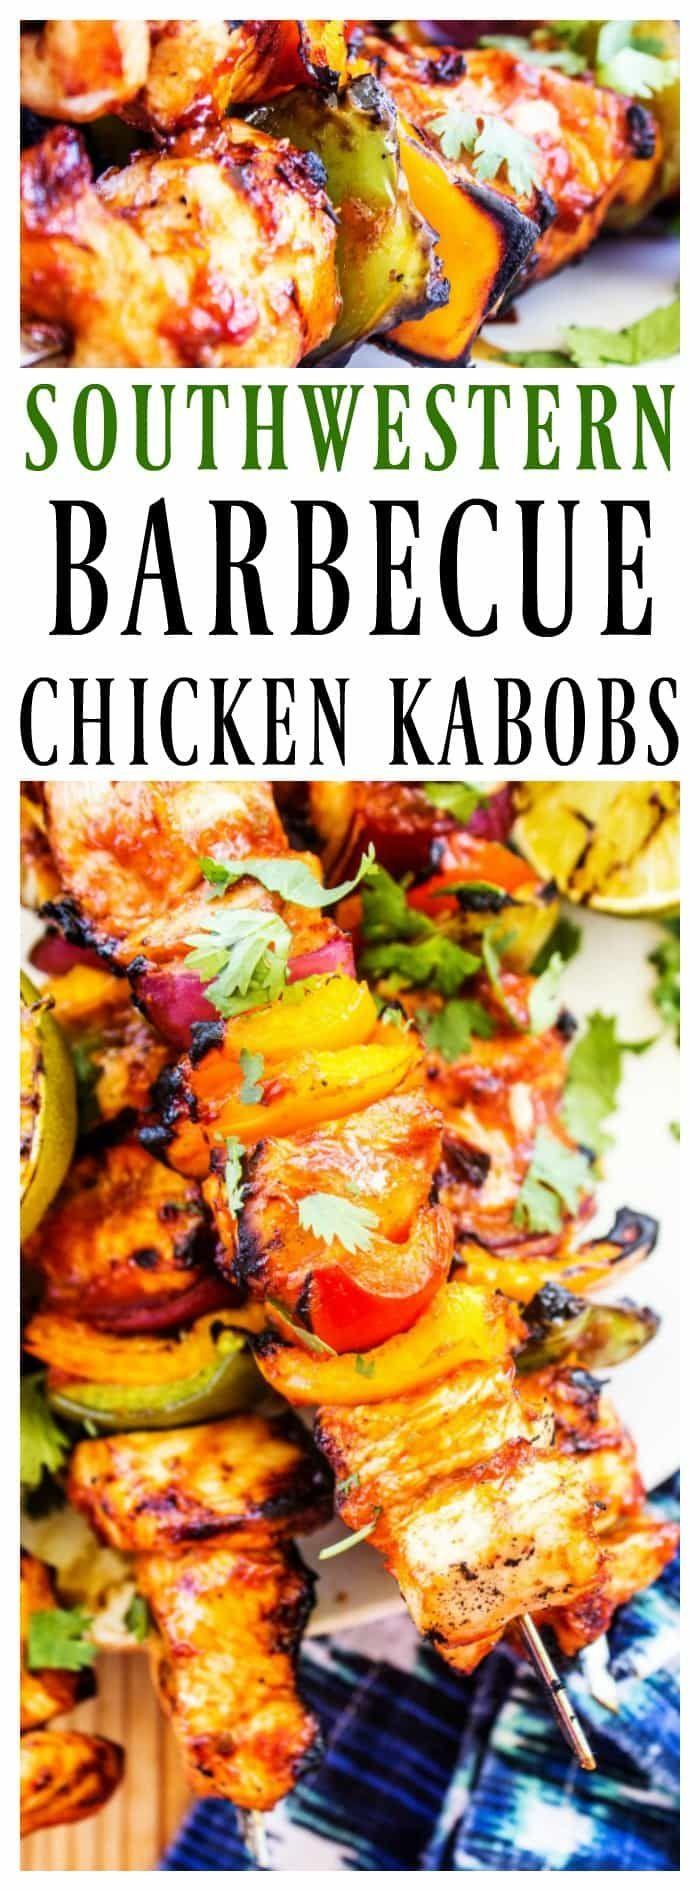 Southwestern Barbecue Chicken Kabobs Recipe With Images Barbecue Chicken Recipes Chicken